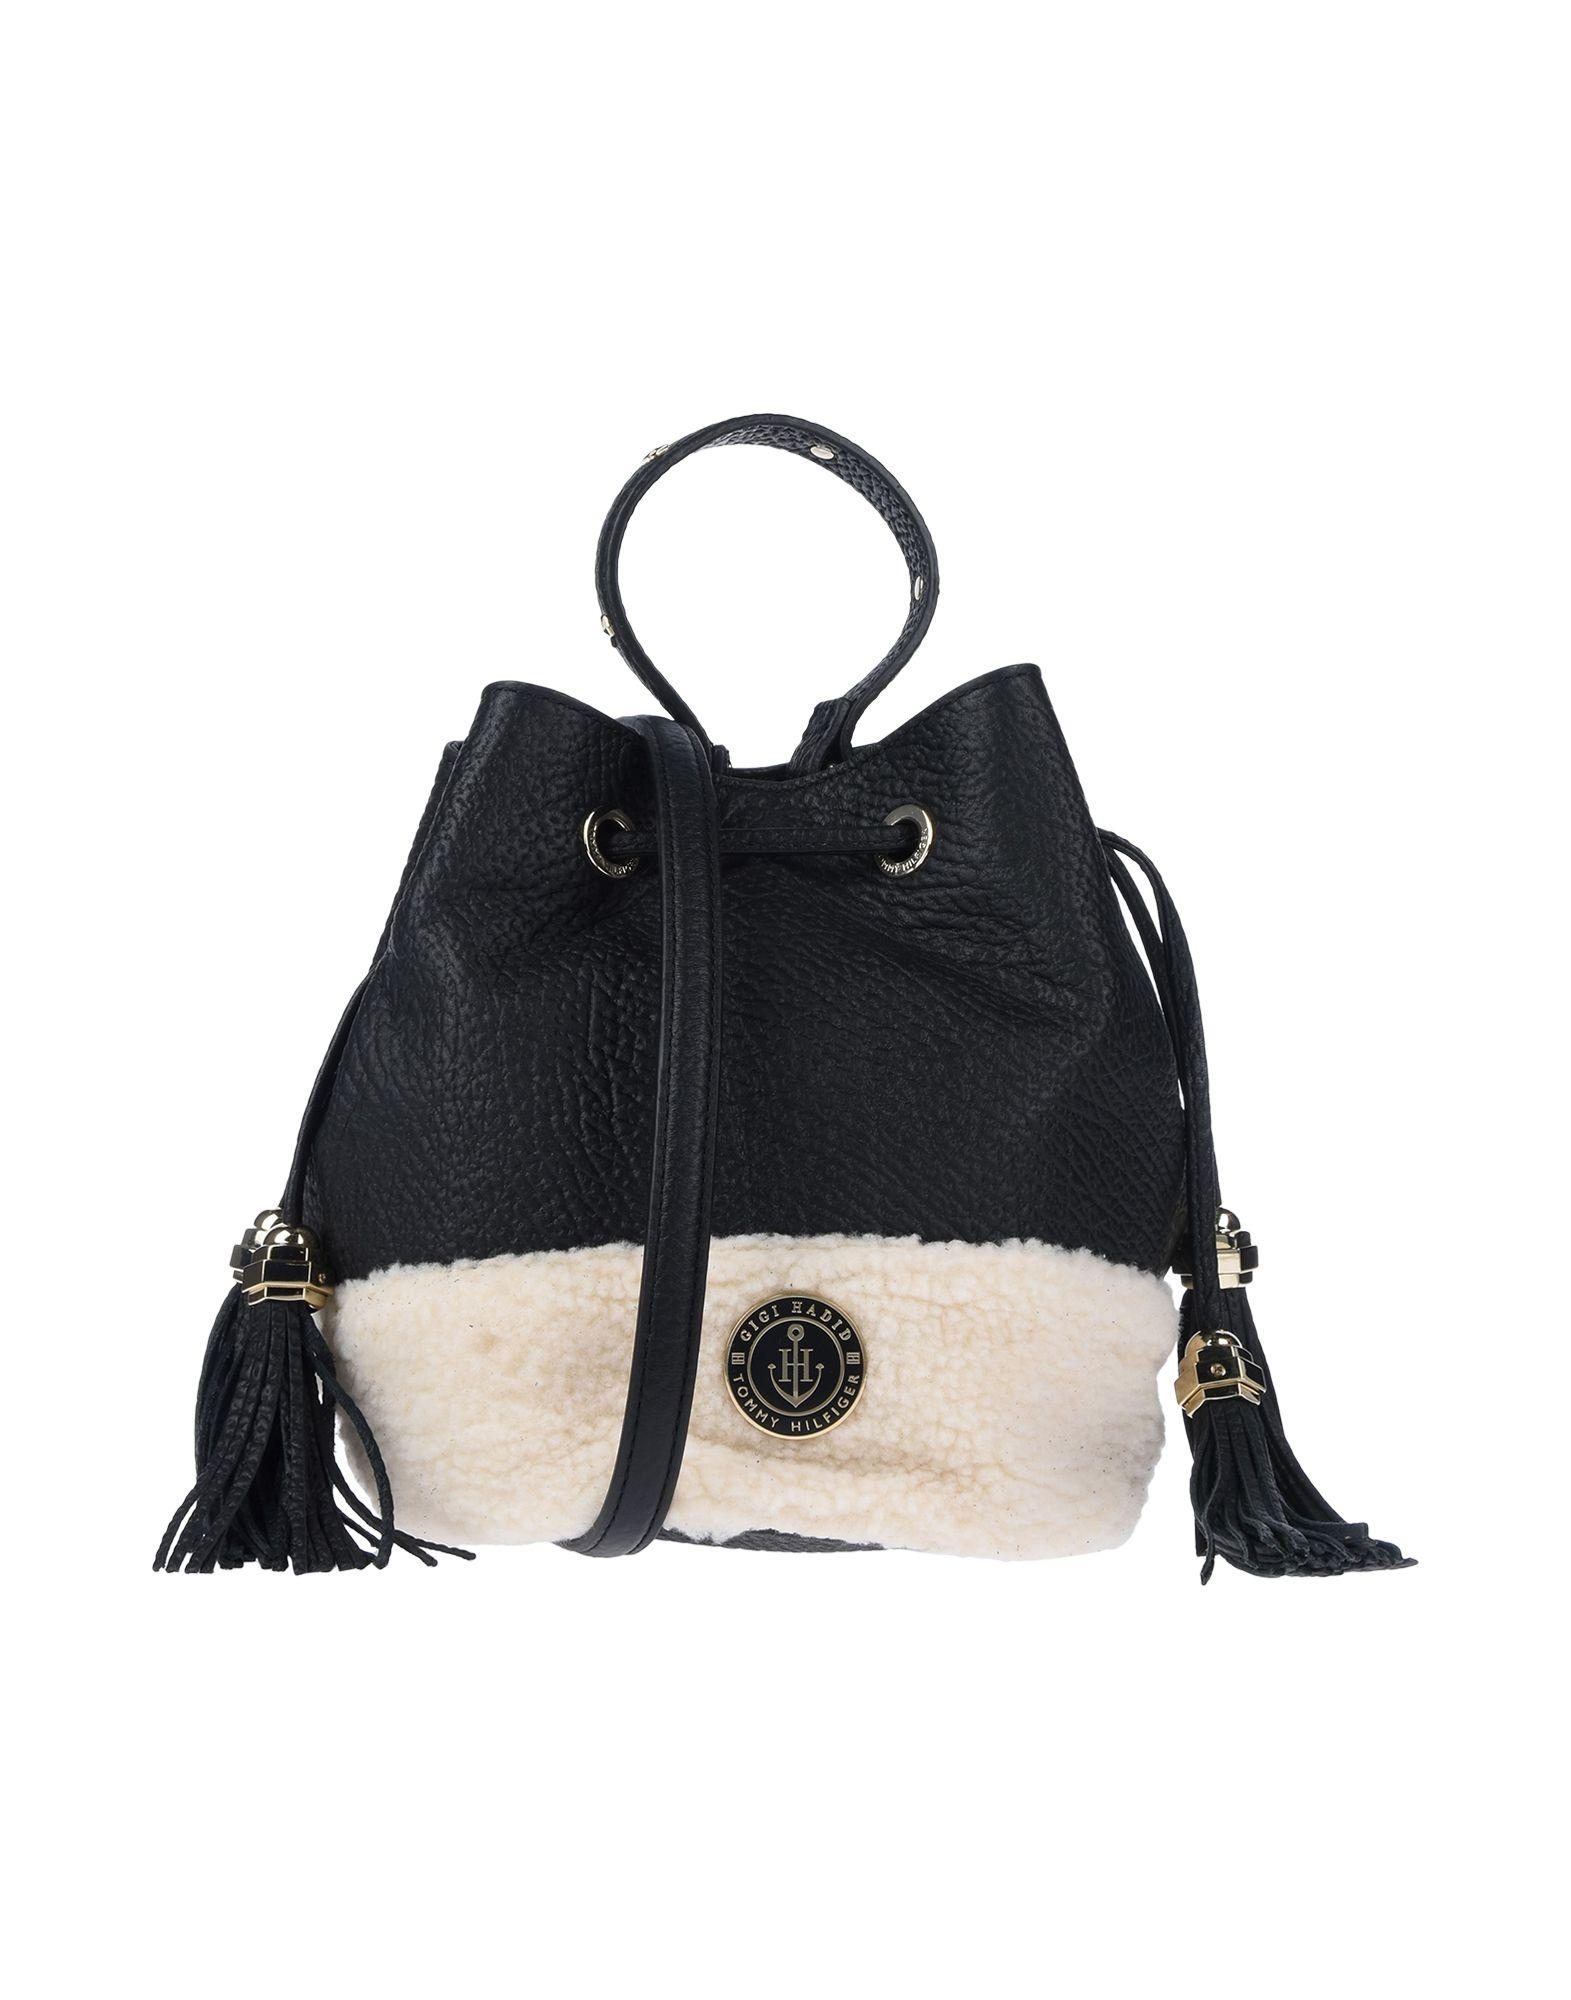 fa4d1d1322 Tommy Hilfiger Handbag in Black - Lyst